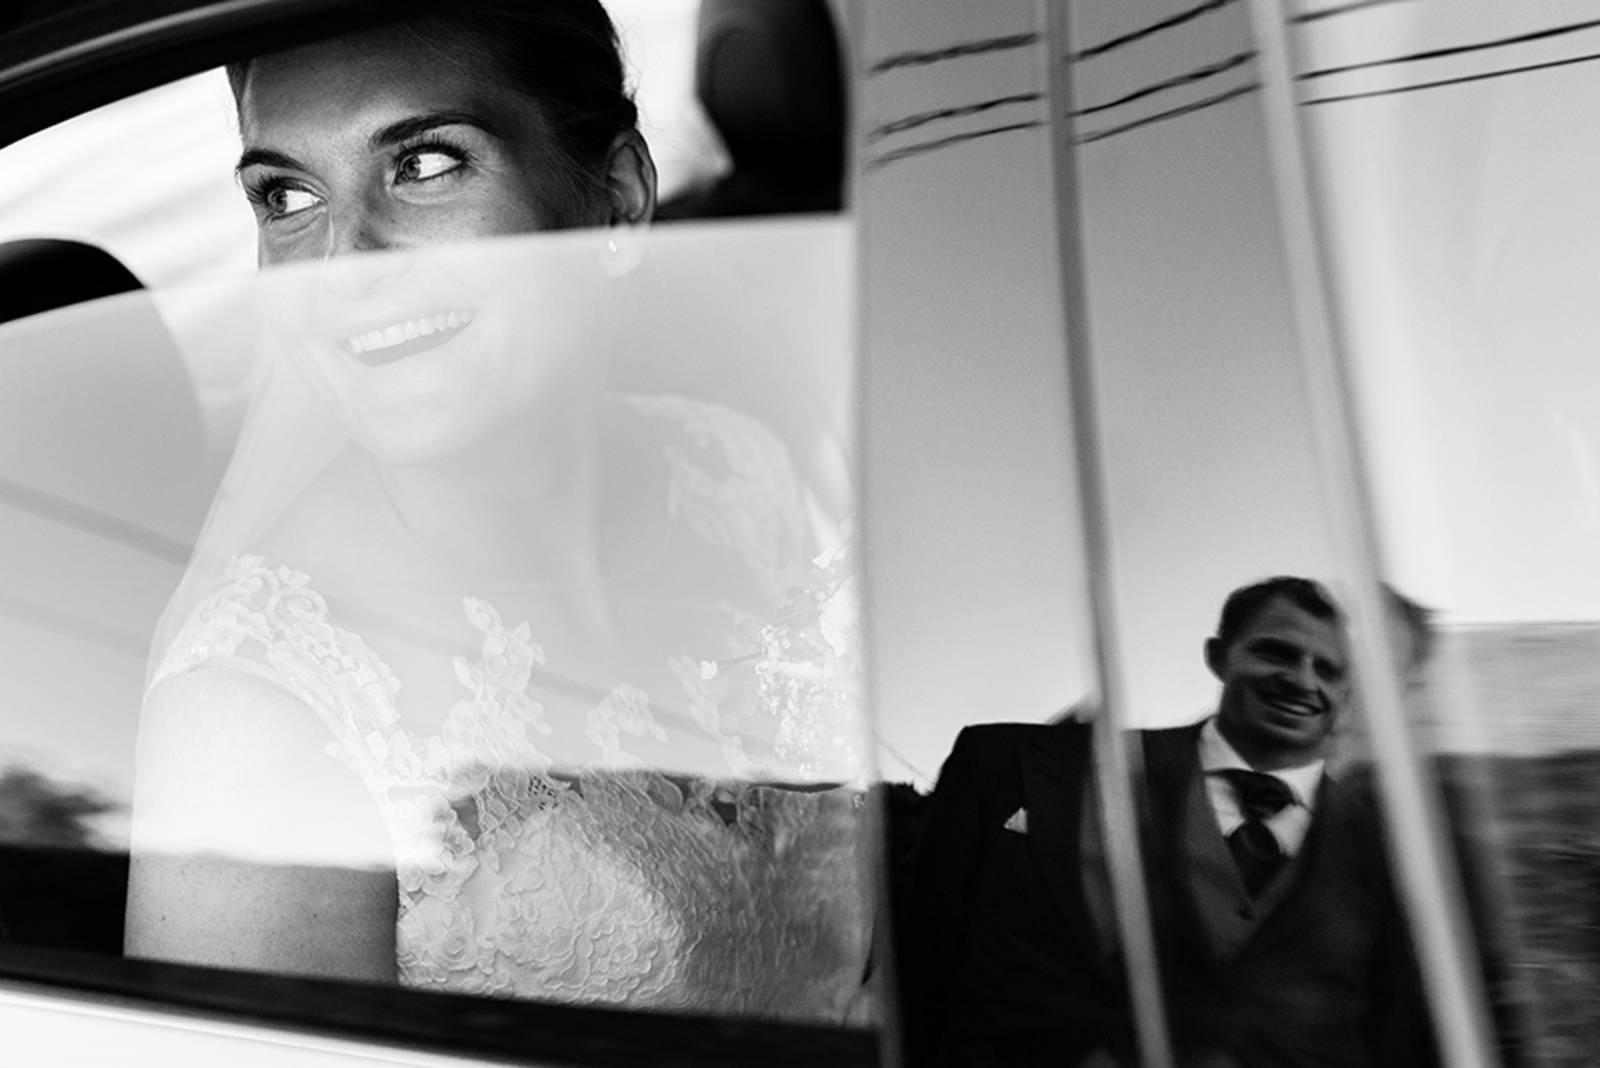 Fotografie Melody - Huwelijksfotograaf - Trouwfotograaf - House of Weddings - 23